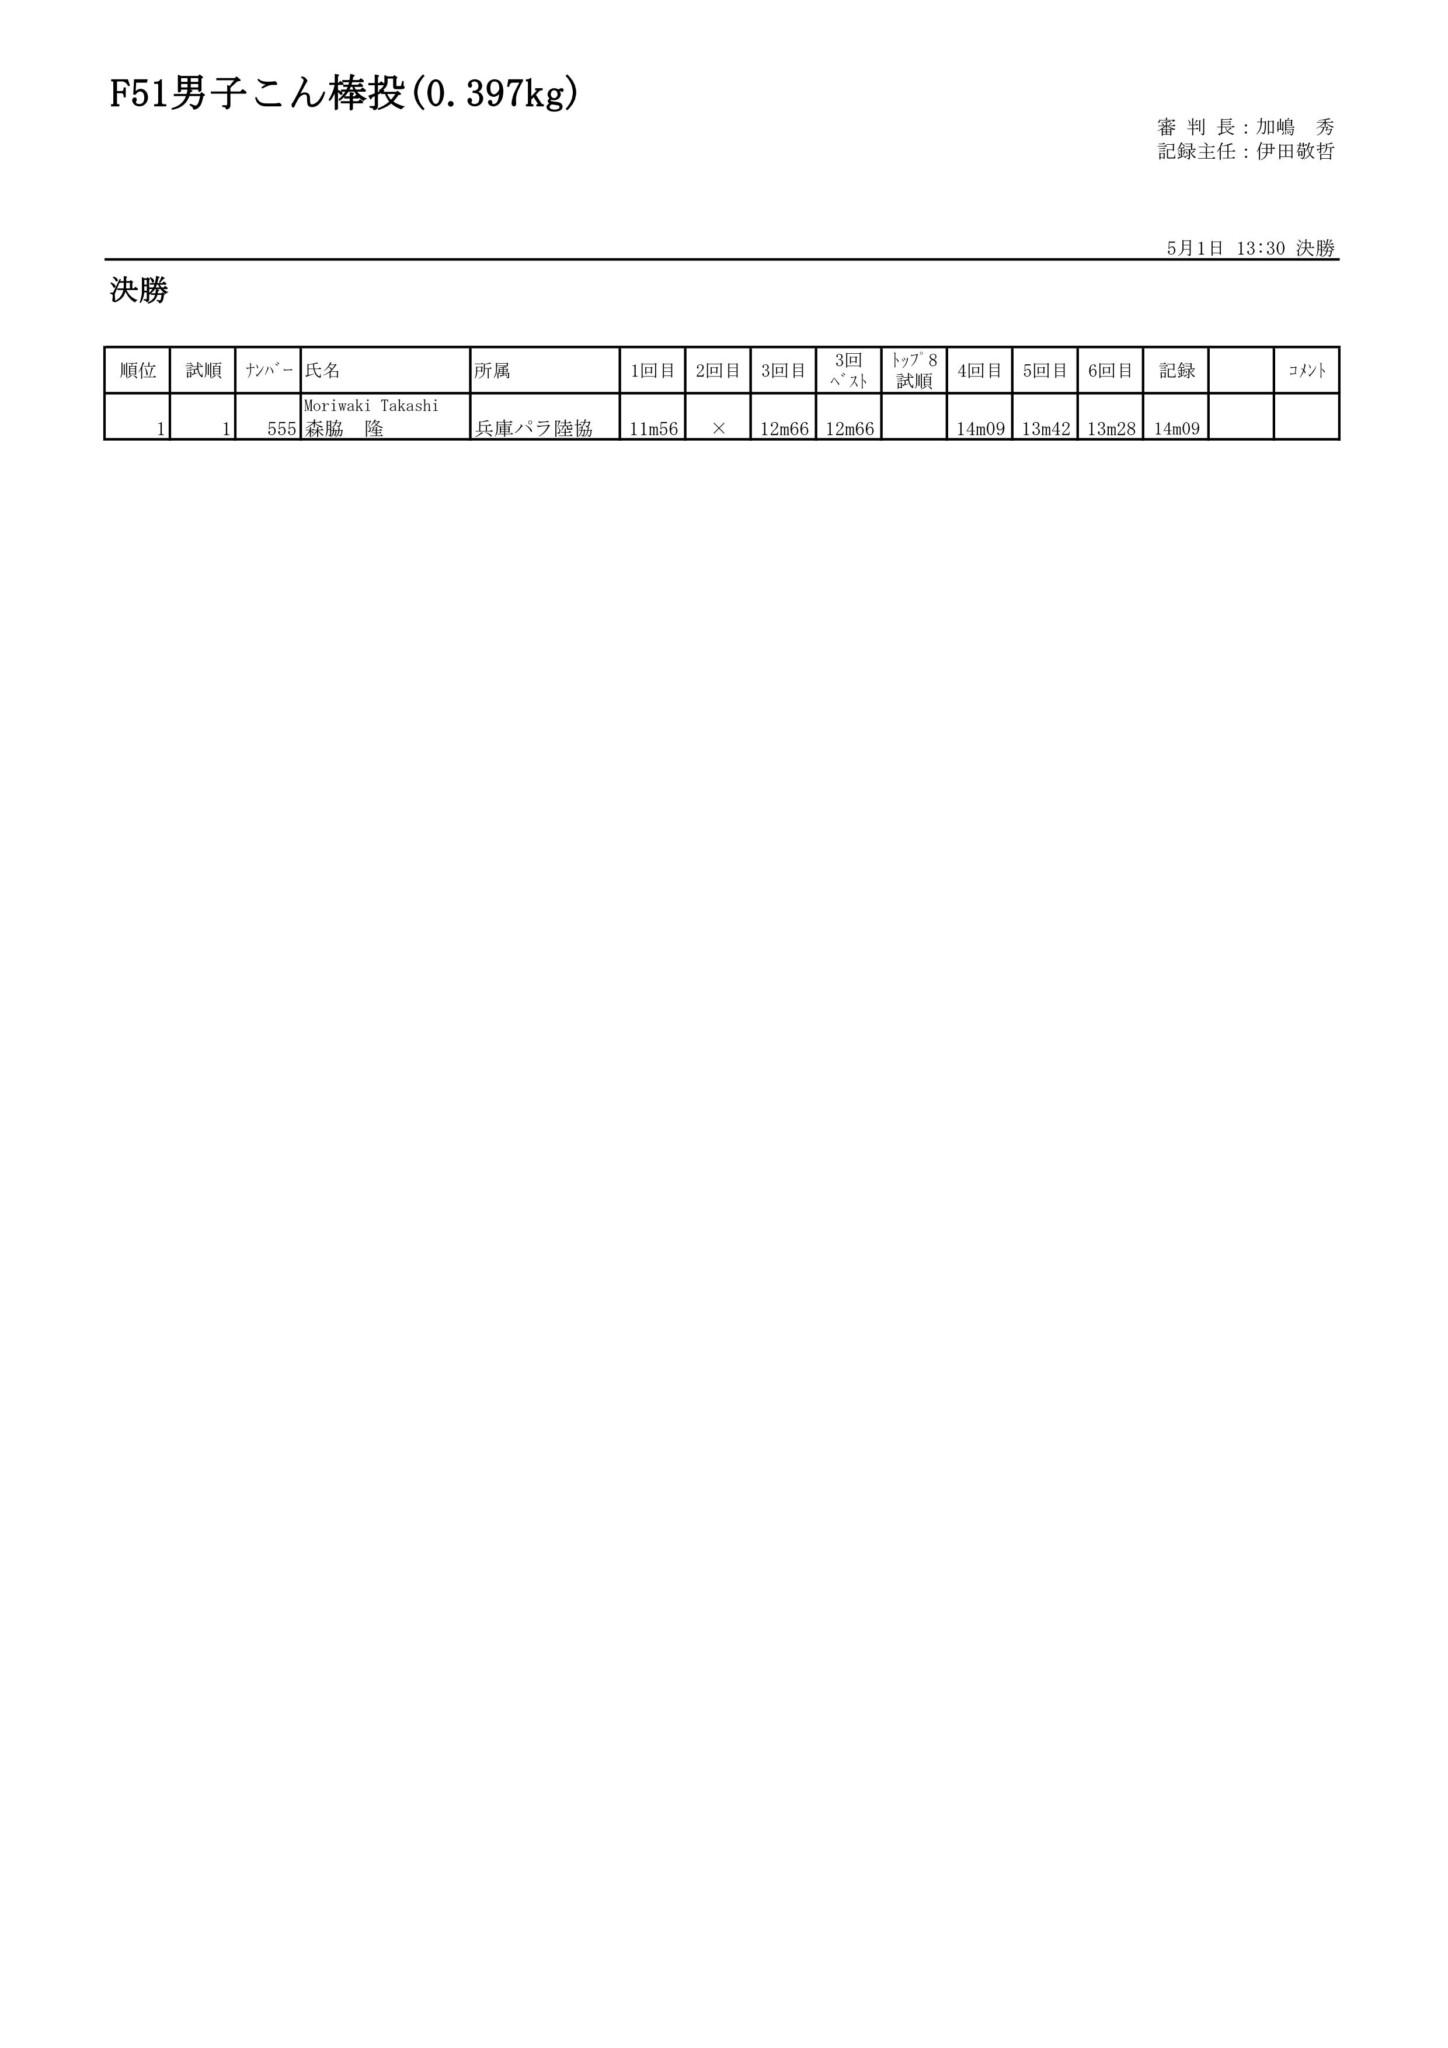 60F51男子こん棒投(0.397kg)_01